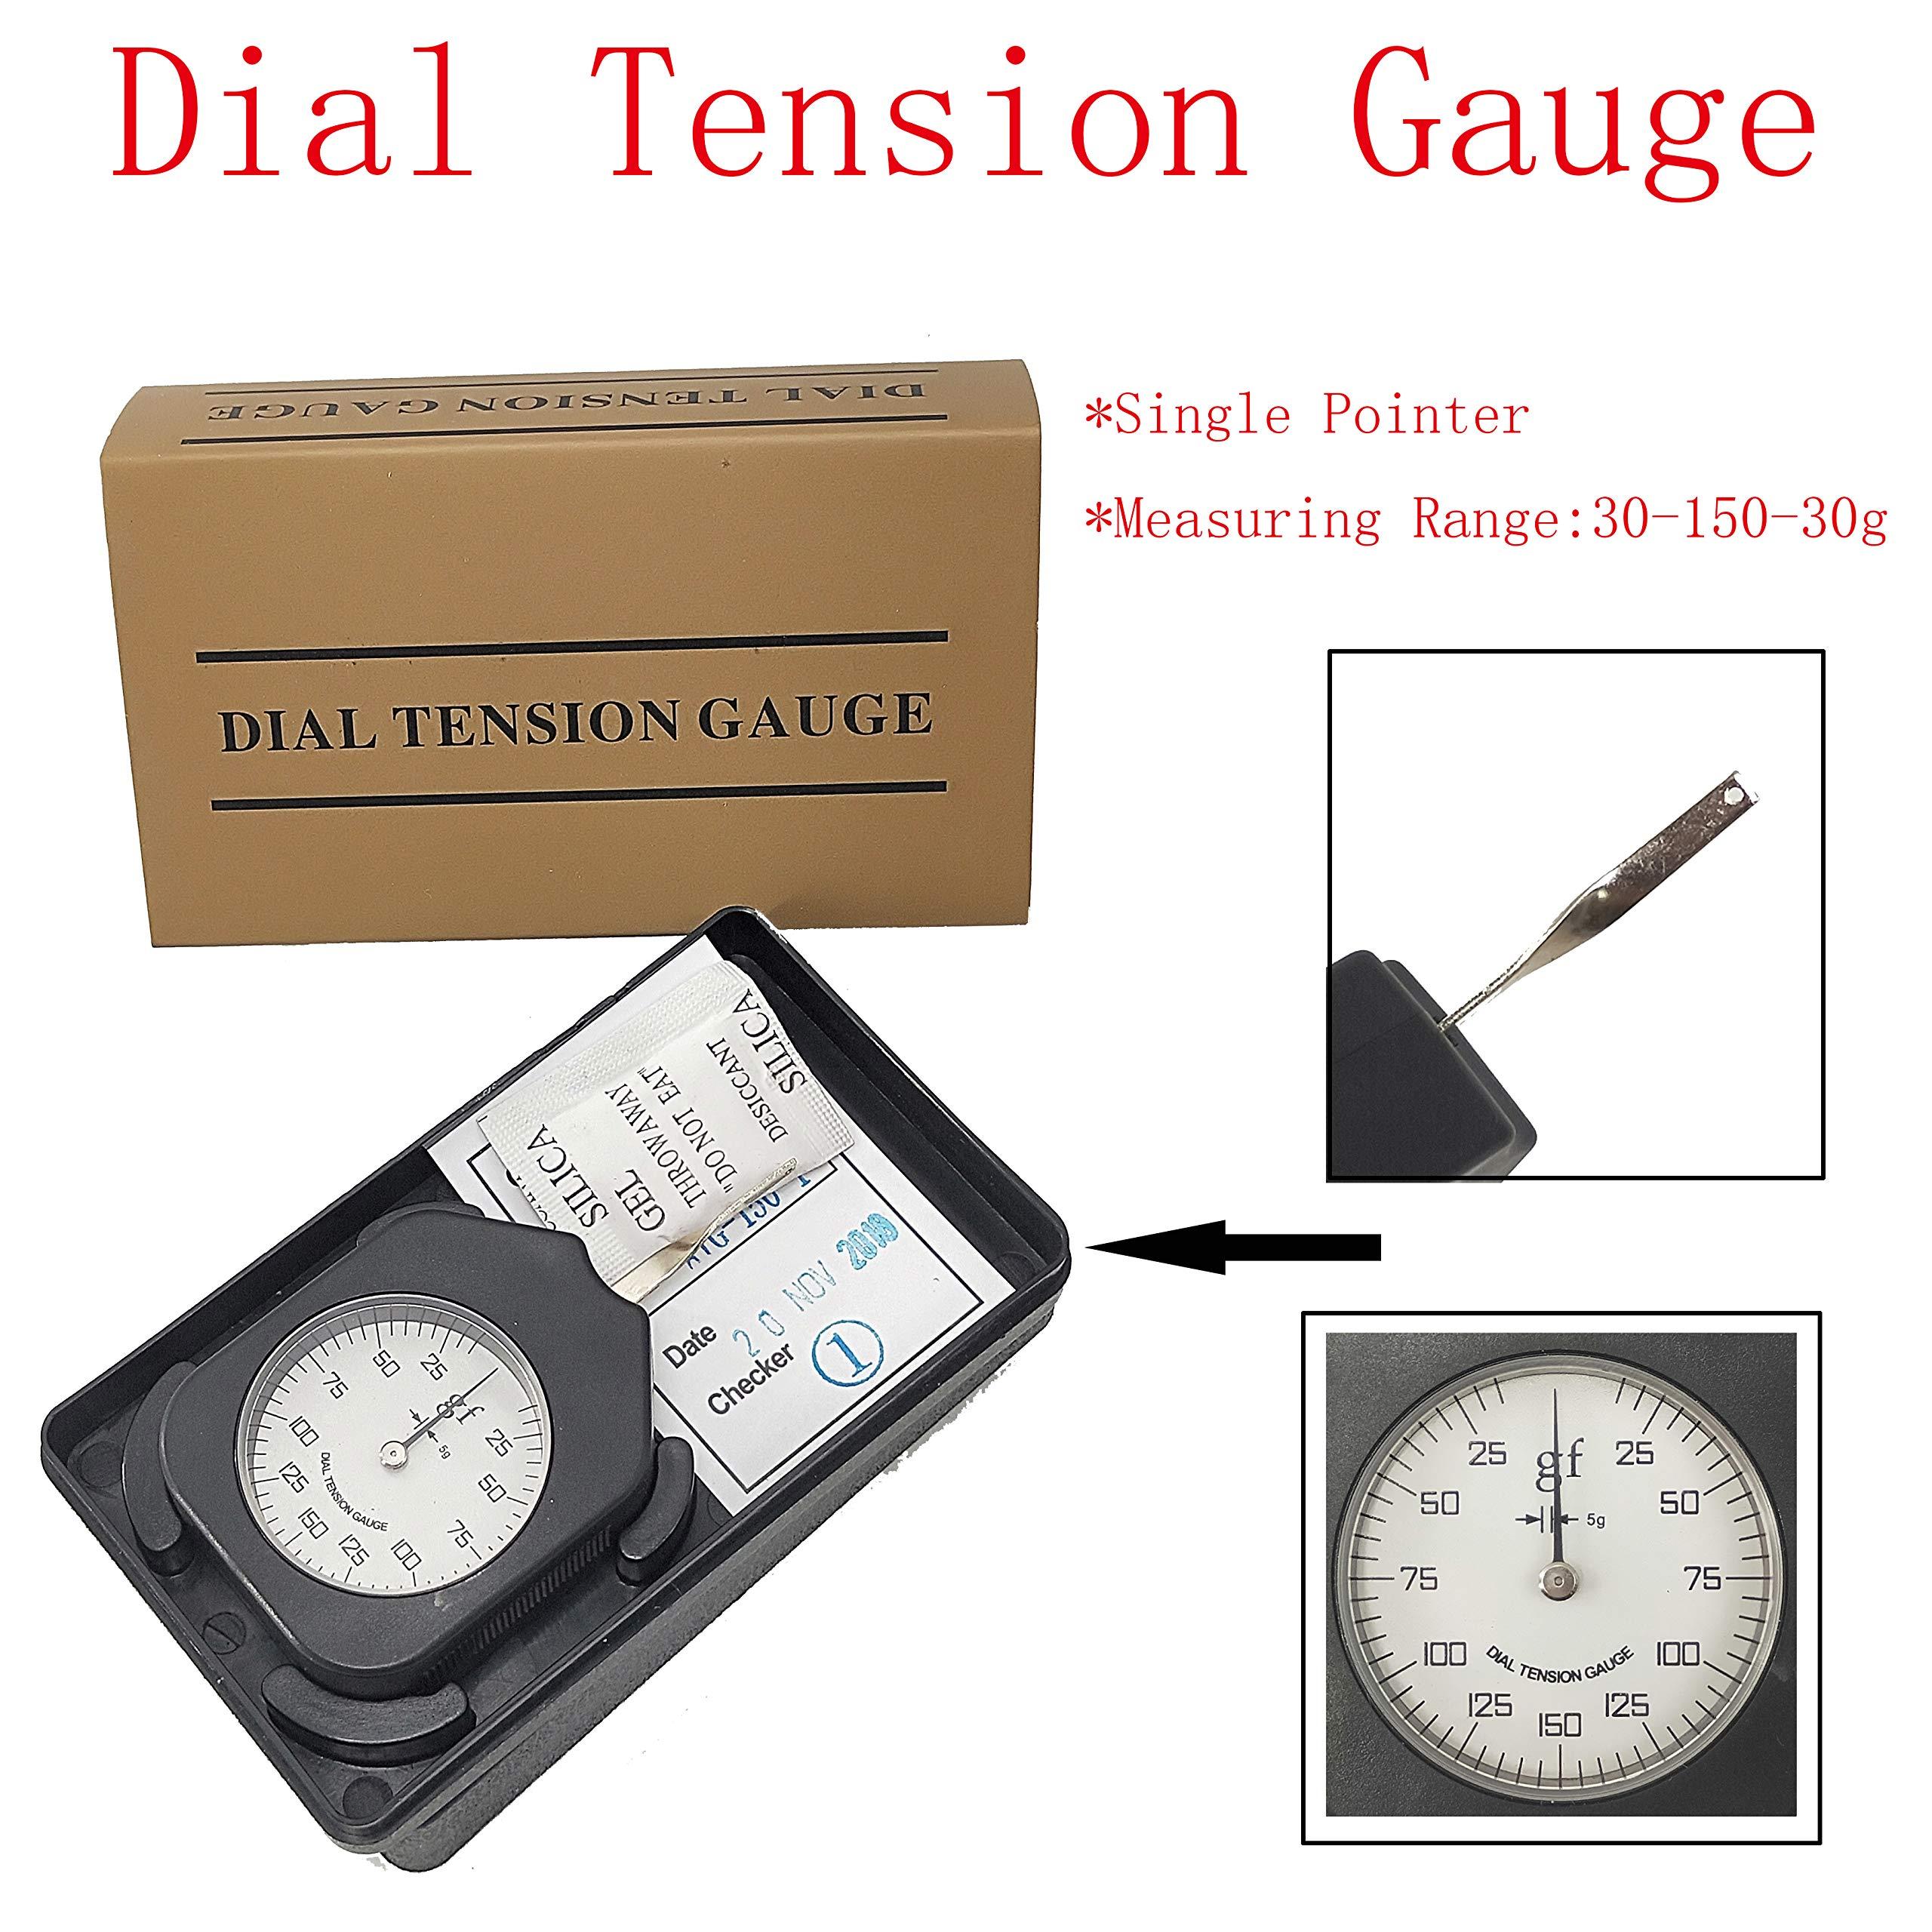 YFYIQI Dial Tensionmeter Tension Gauge Tension Gauge Single Pointer Gram Force Meter with Max Tension Measuring Value 150g by YFYIQI